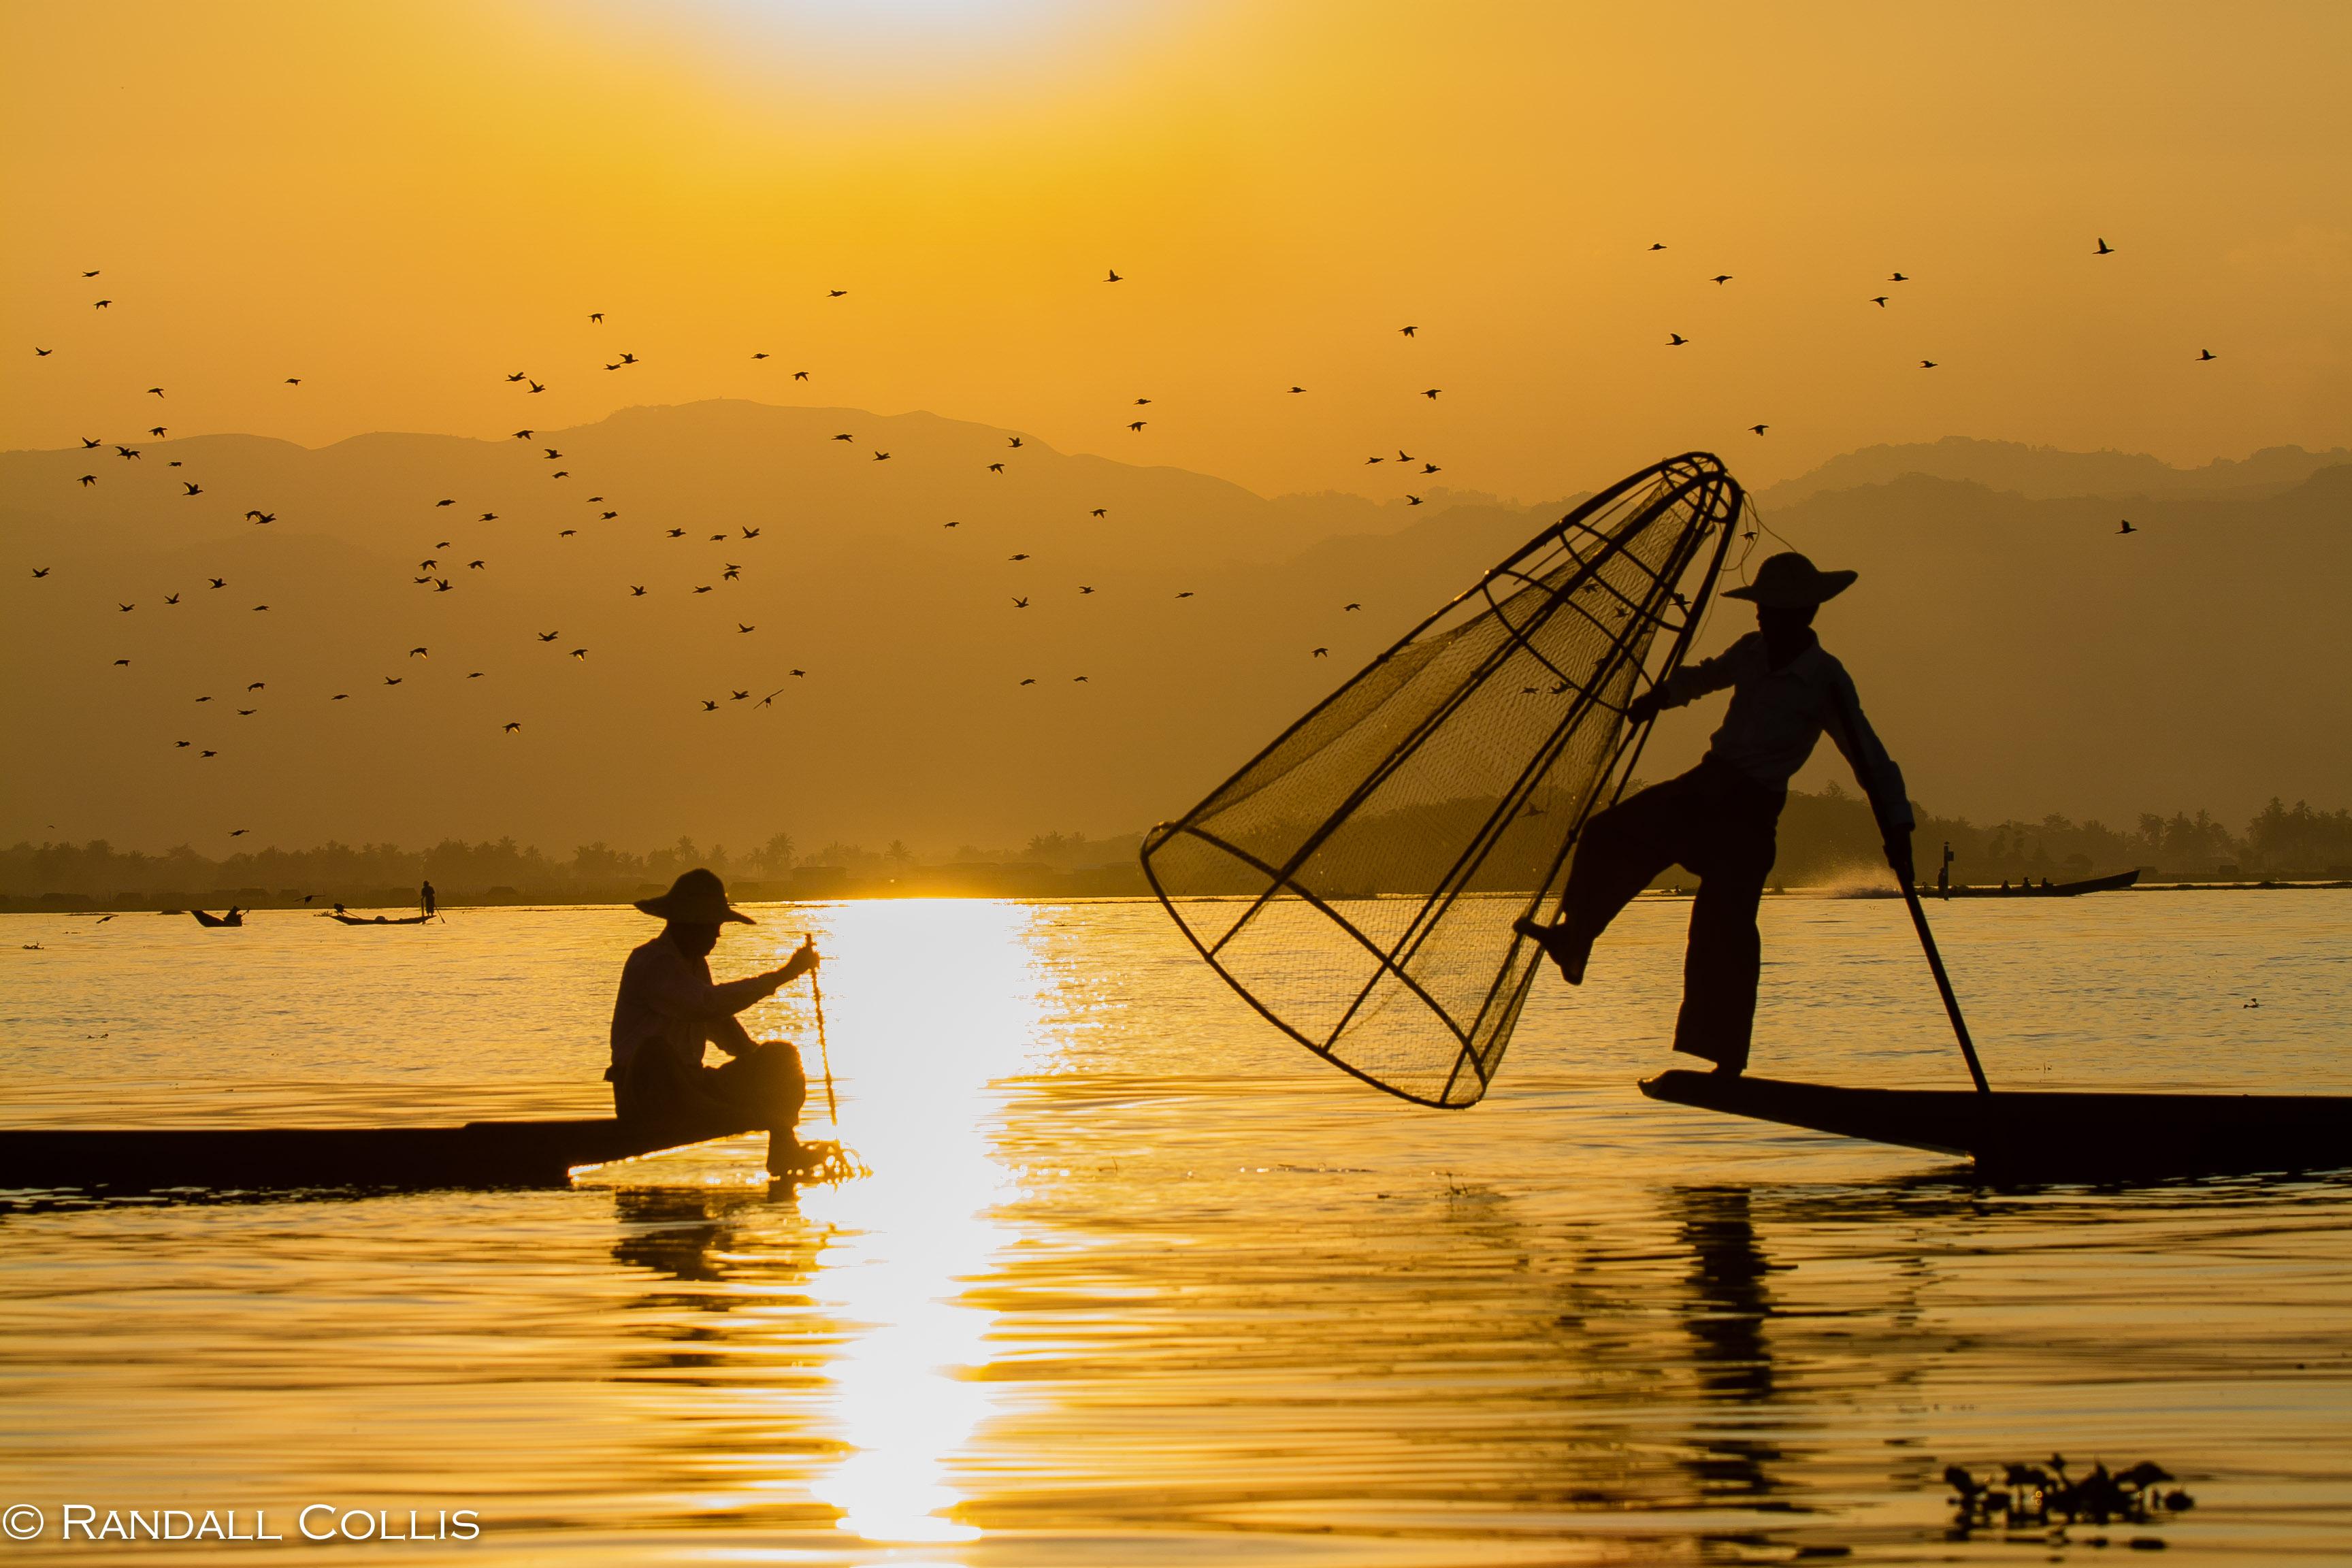 The Fishermen's Lore: What Lies Beneath?